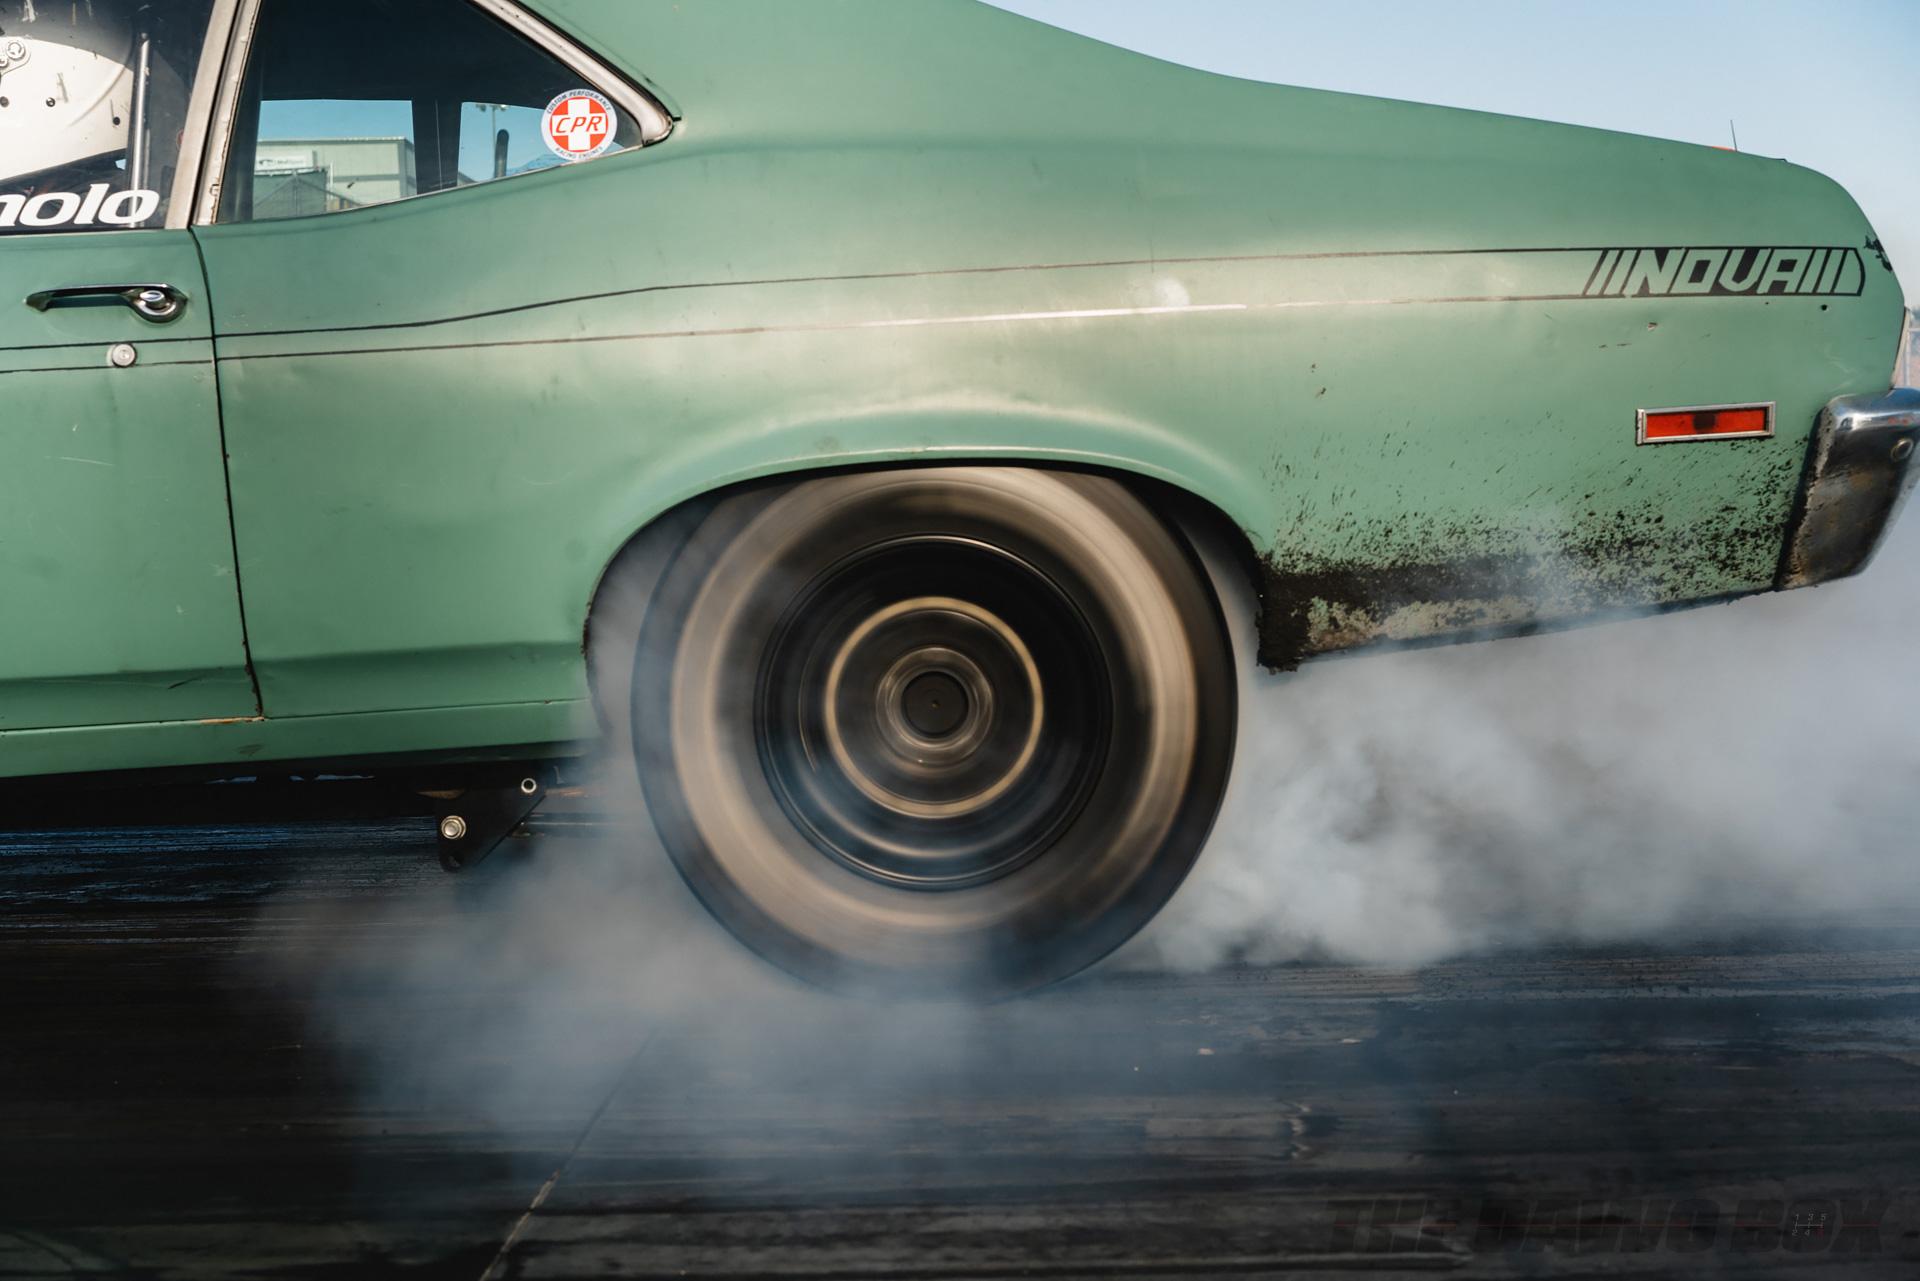 Green Chevy Nova doing a burnout